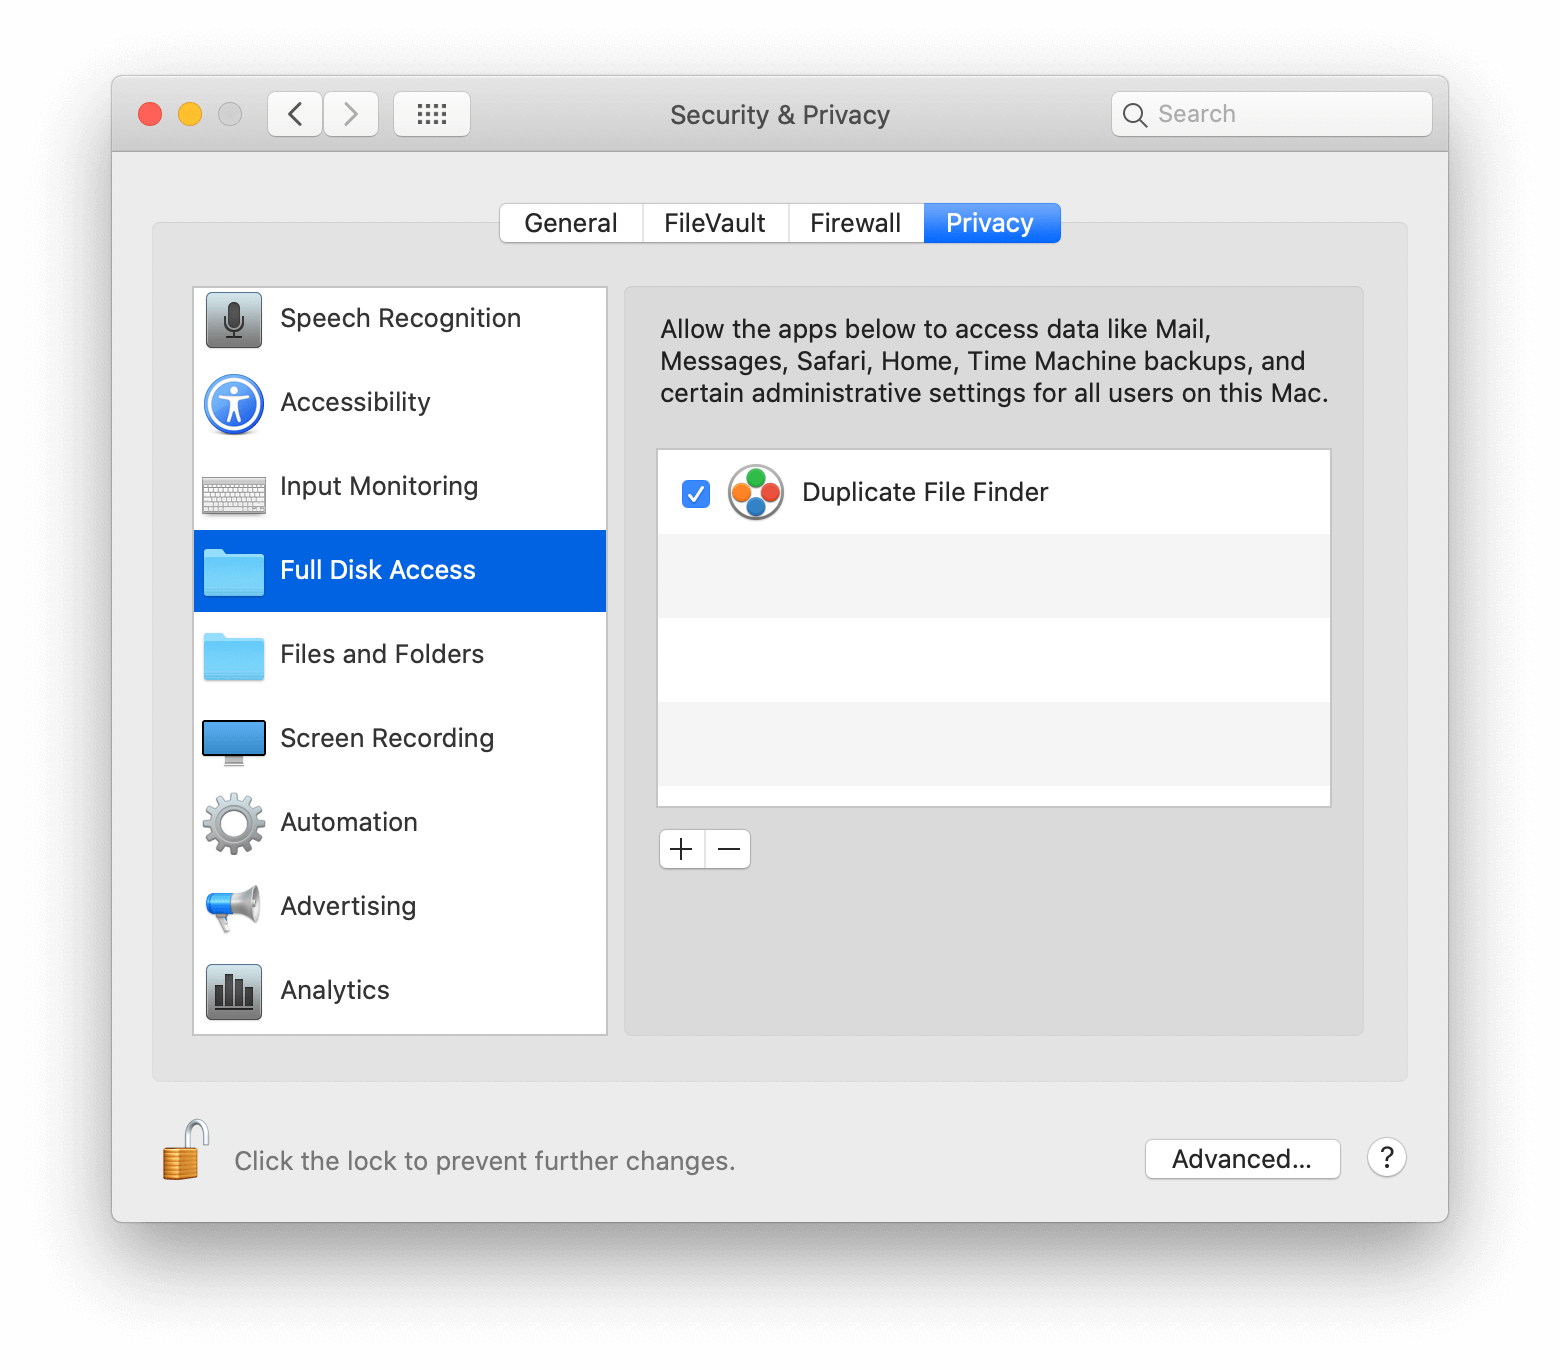 full disk access